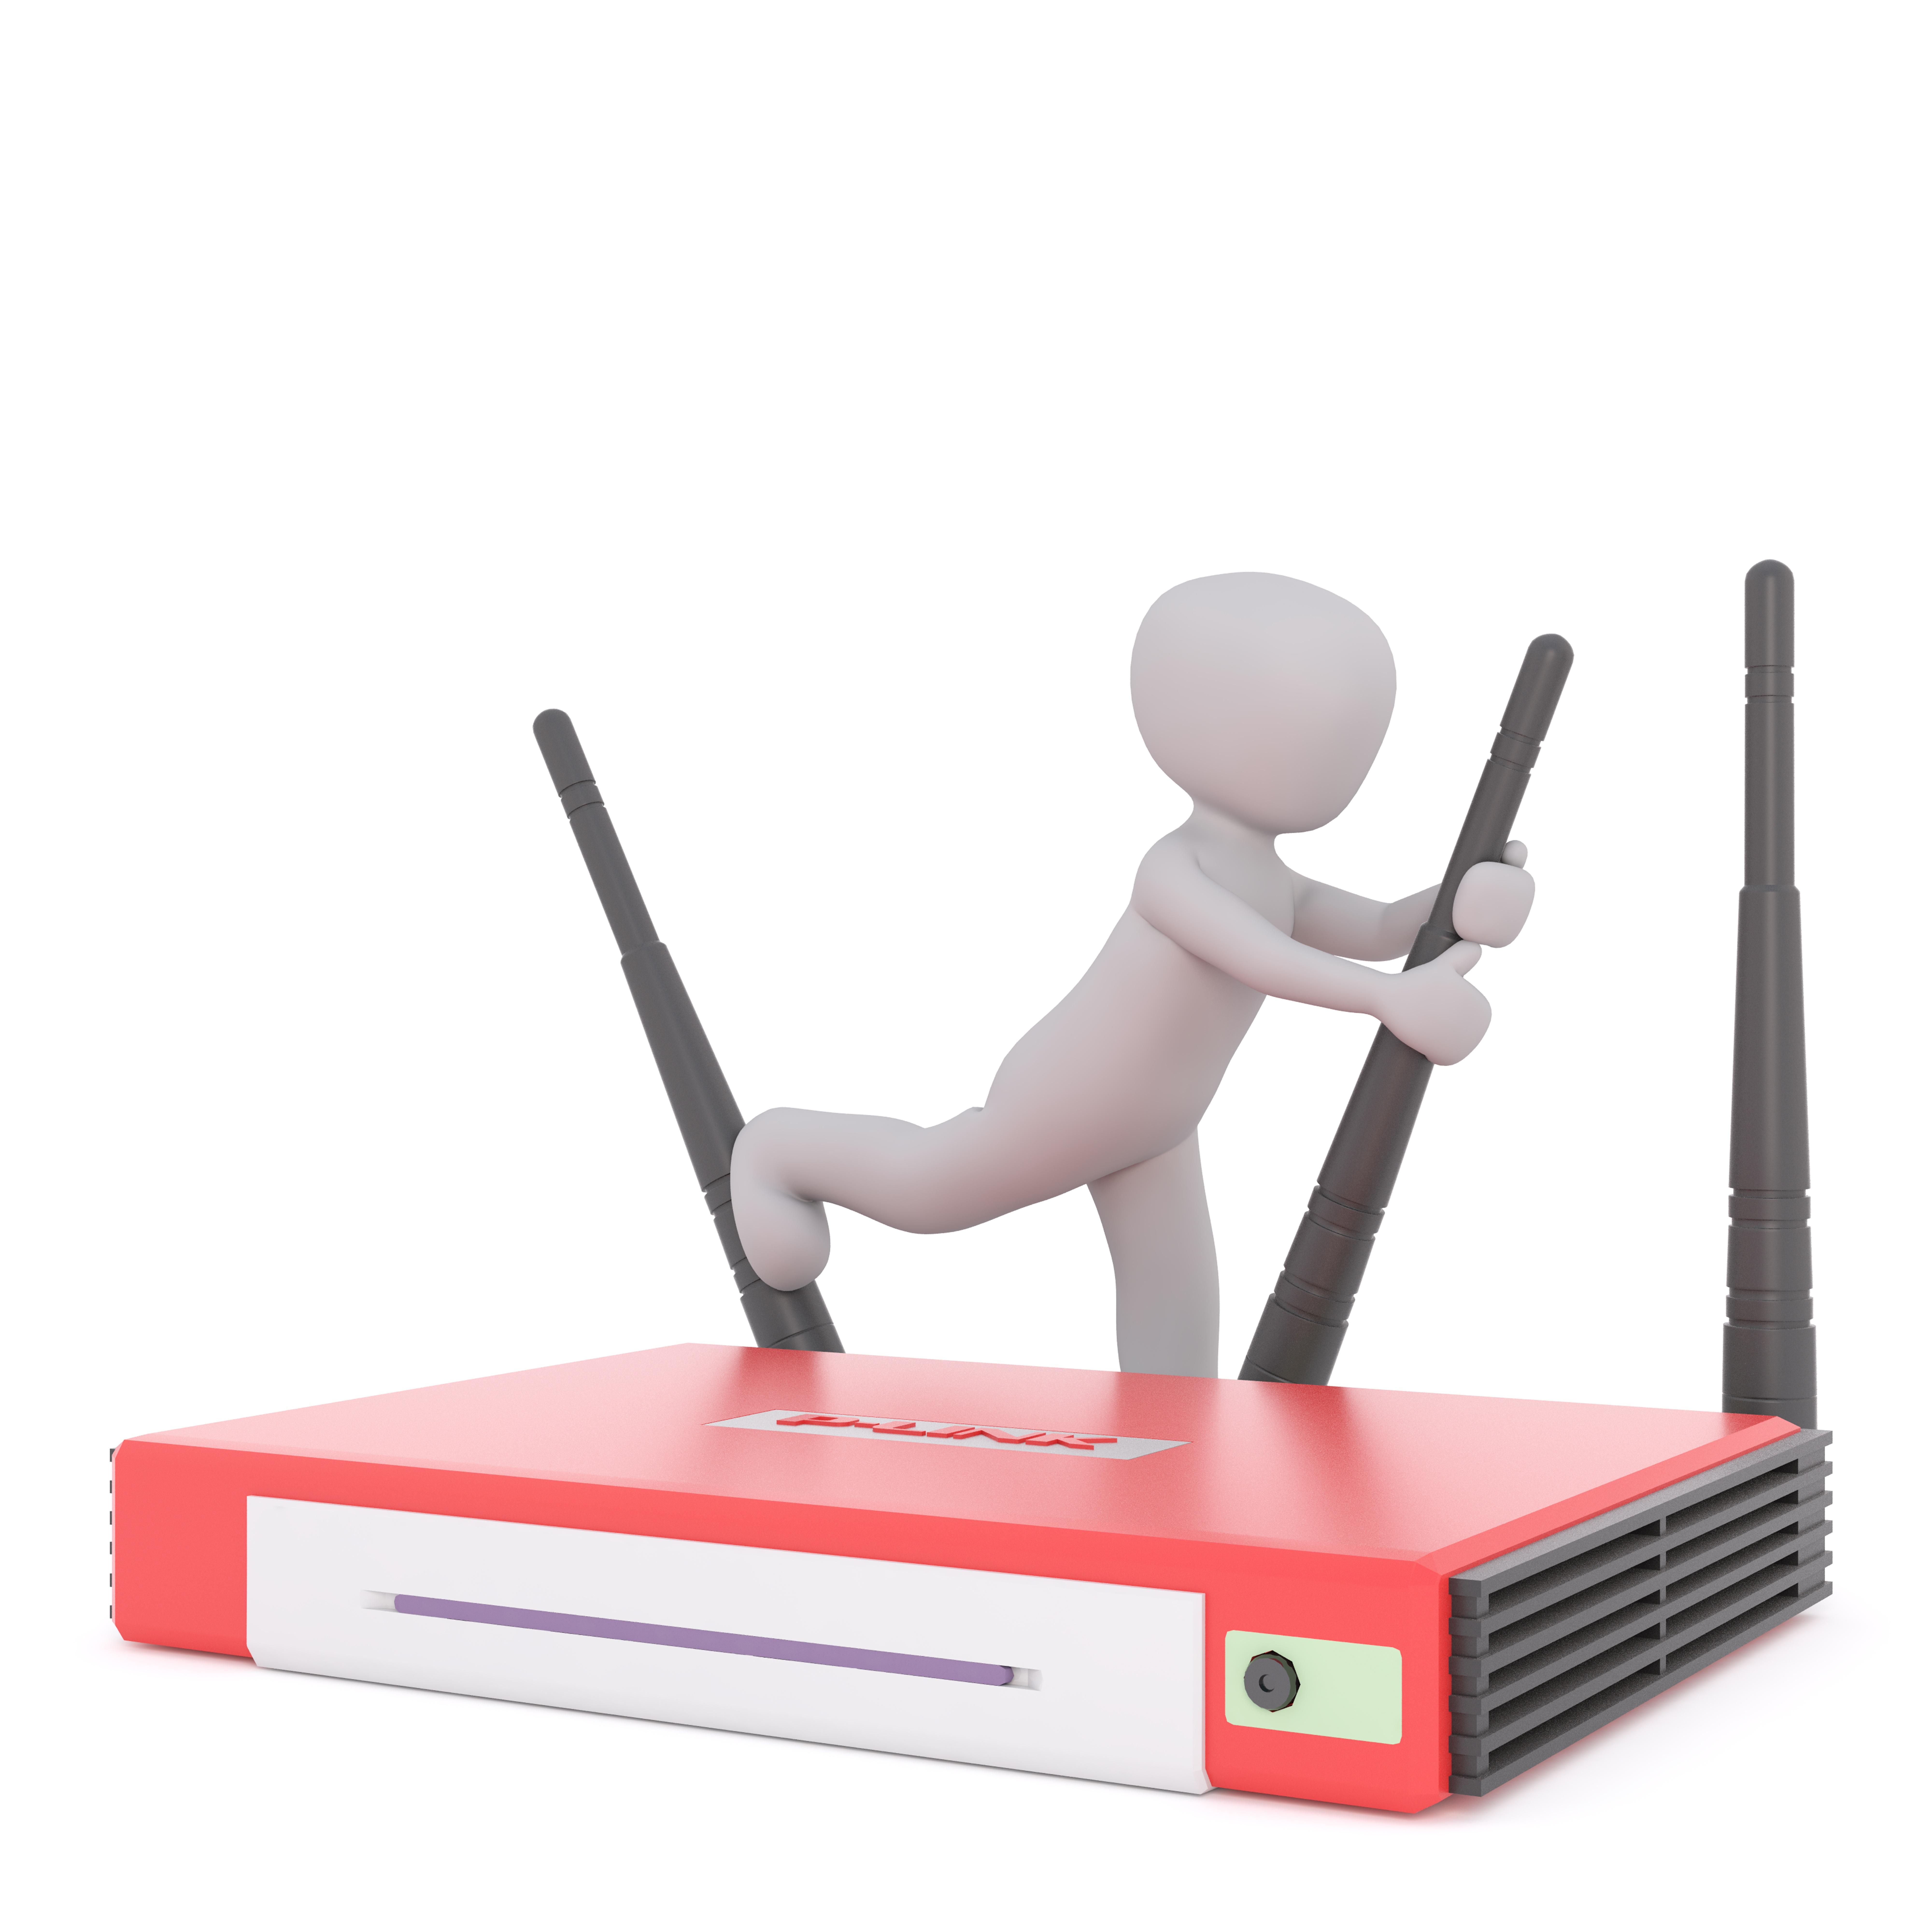 Free Images : technology, isolated, antenna, radio, device, product ...